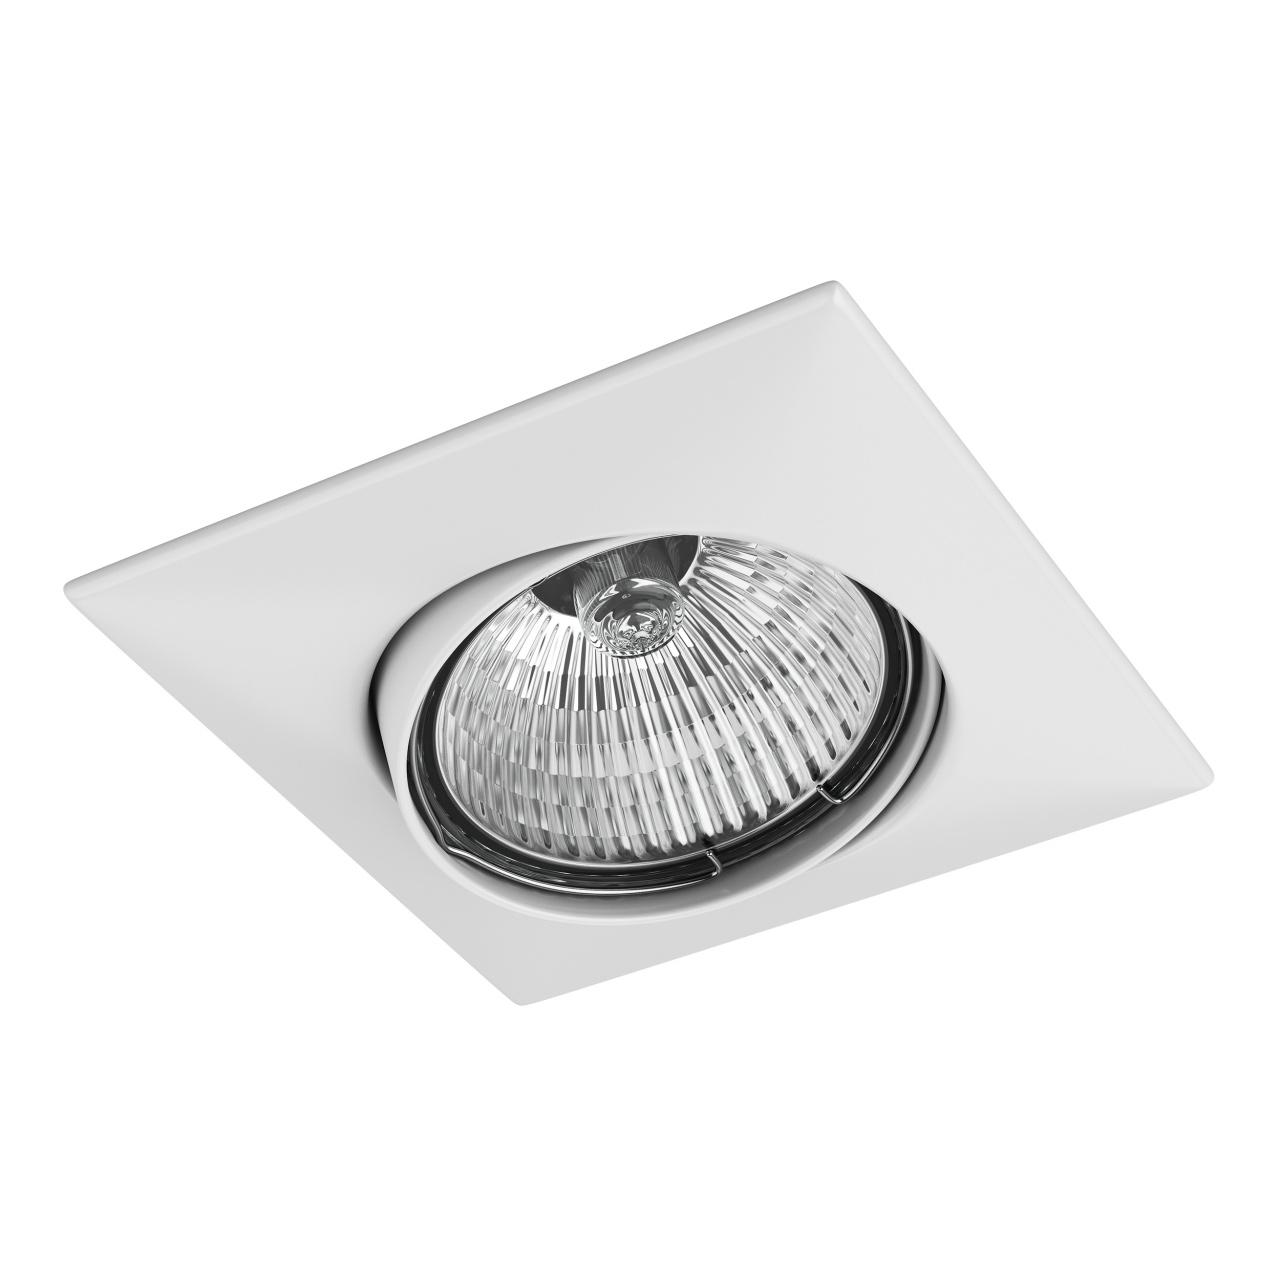 Светильник lega qua ADJ MR16 / HP16 белый Lightstar 011030